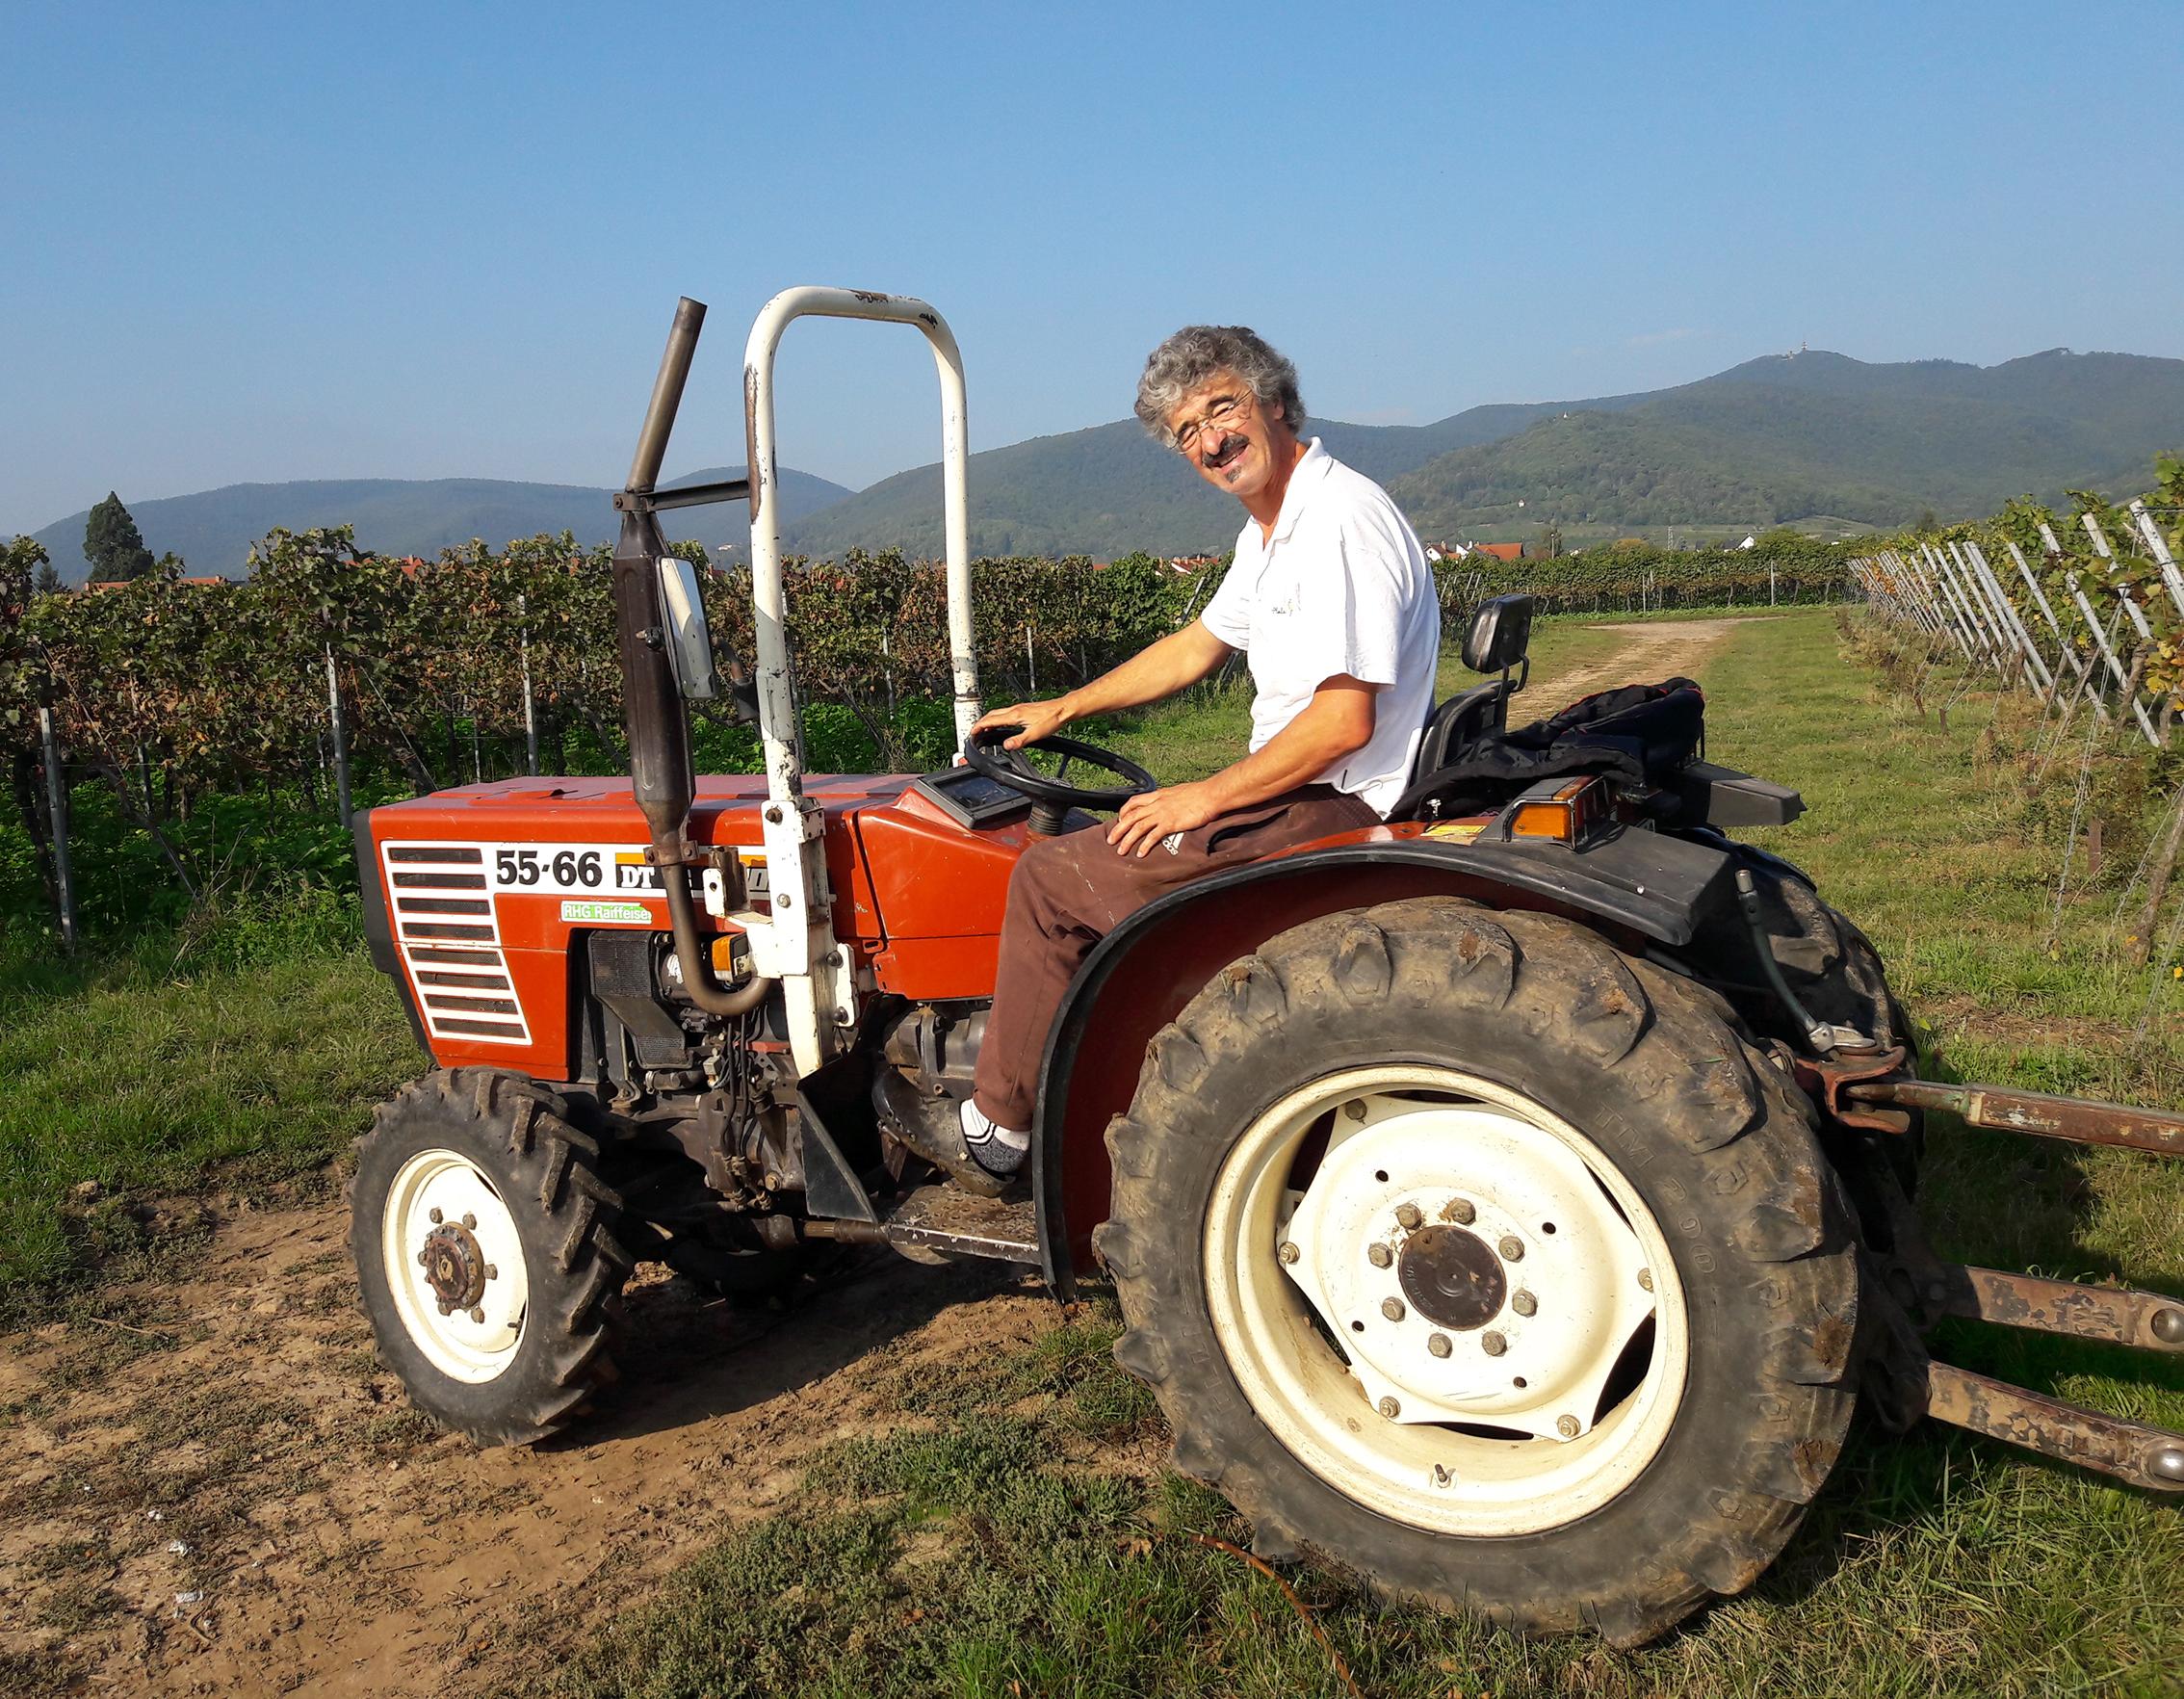 Peter auf dem Traktor